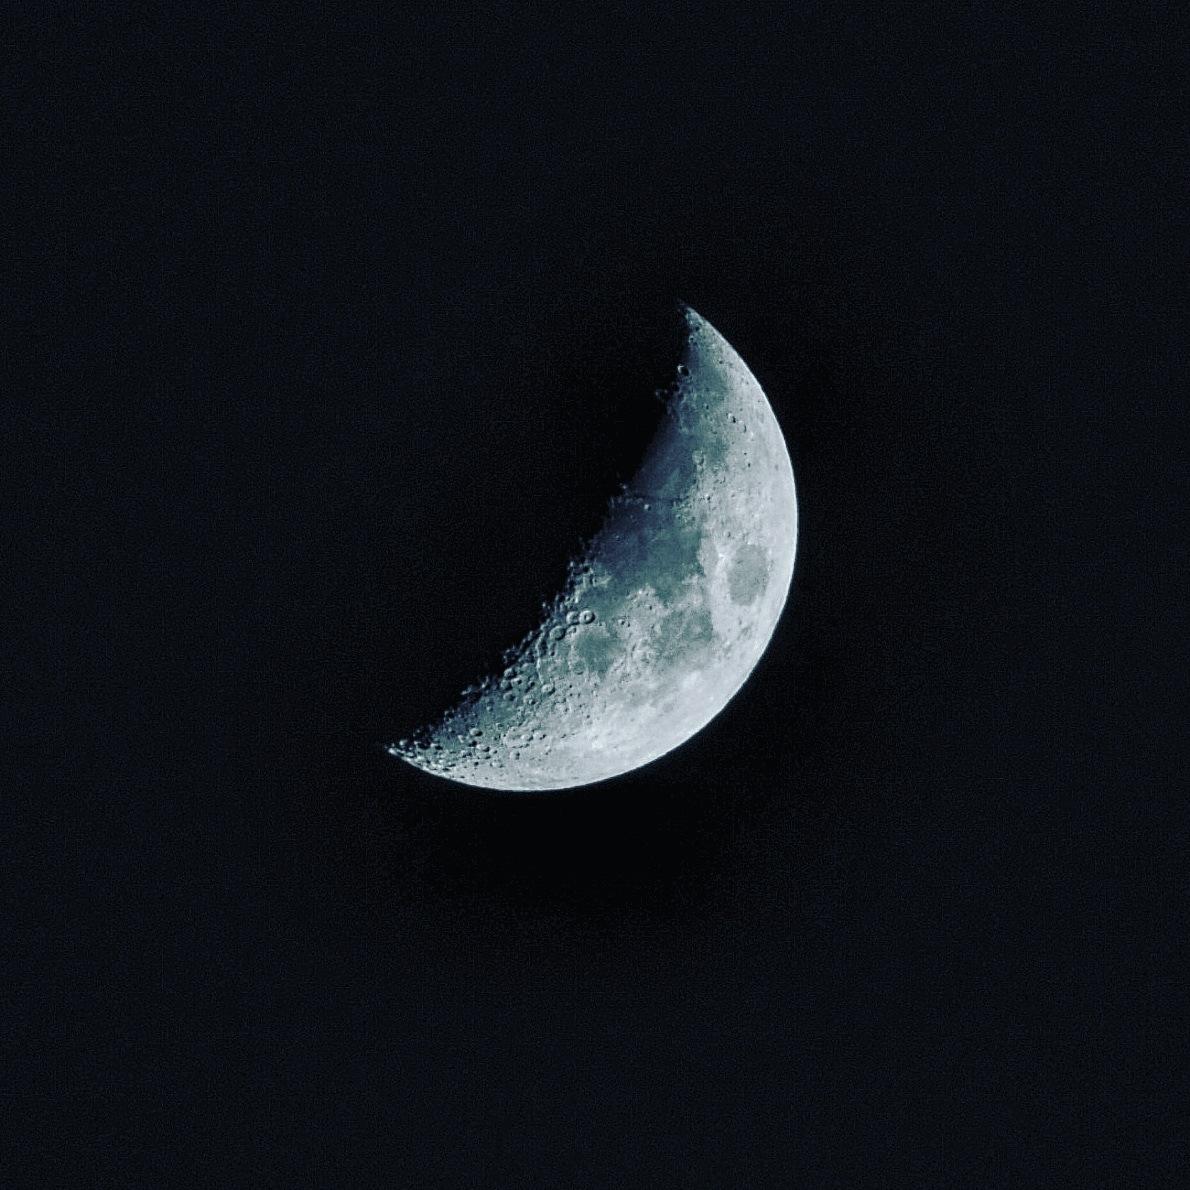 #moon #night #sky #stars  by Adhiraj Sharma